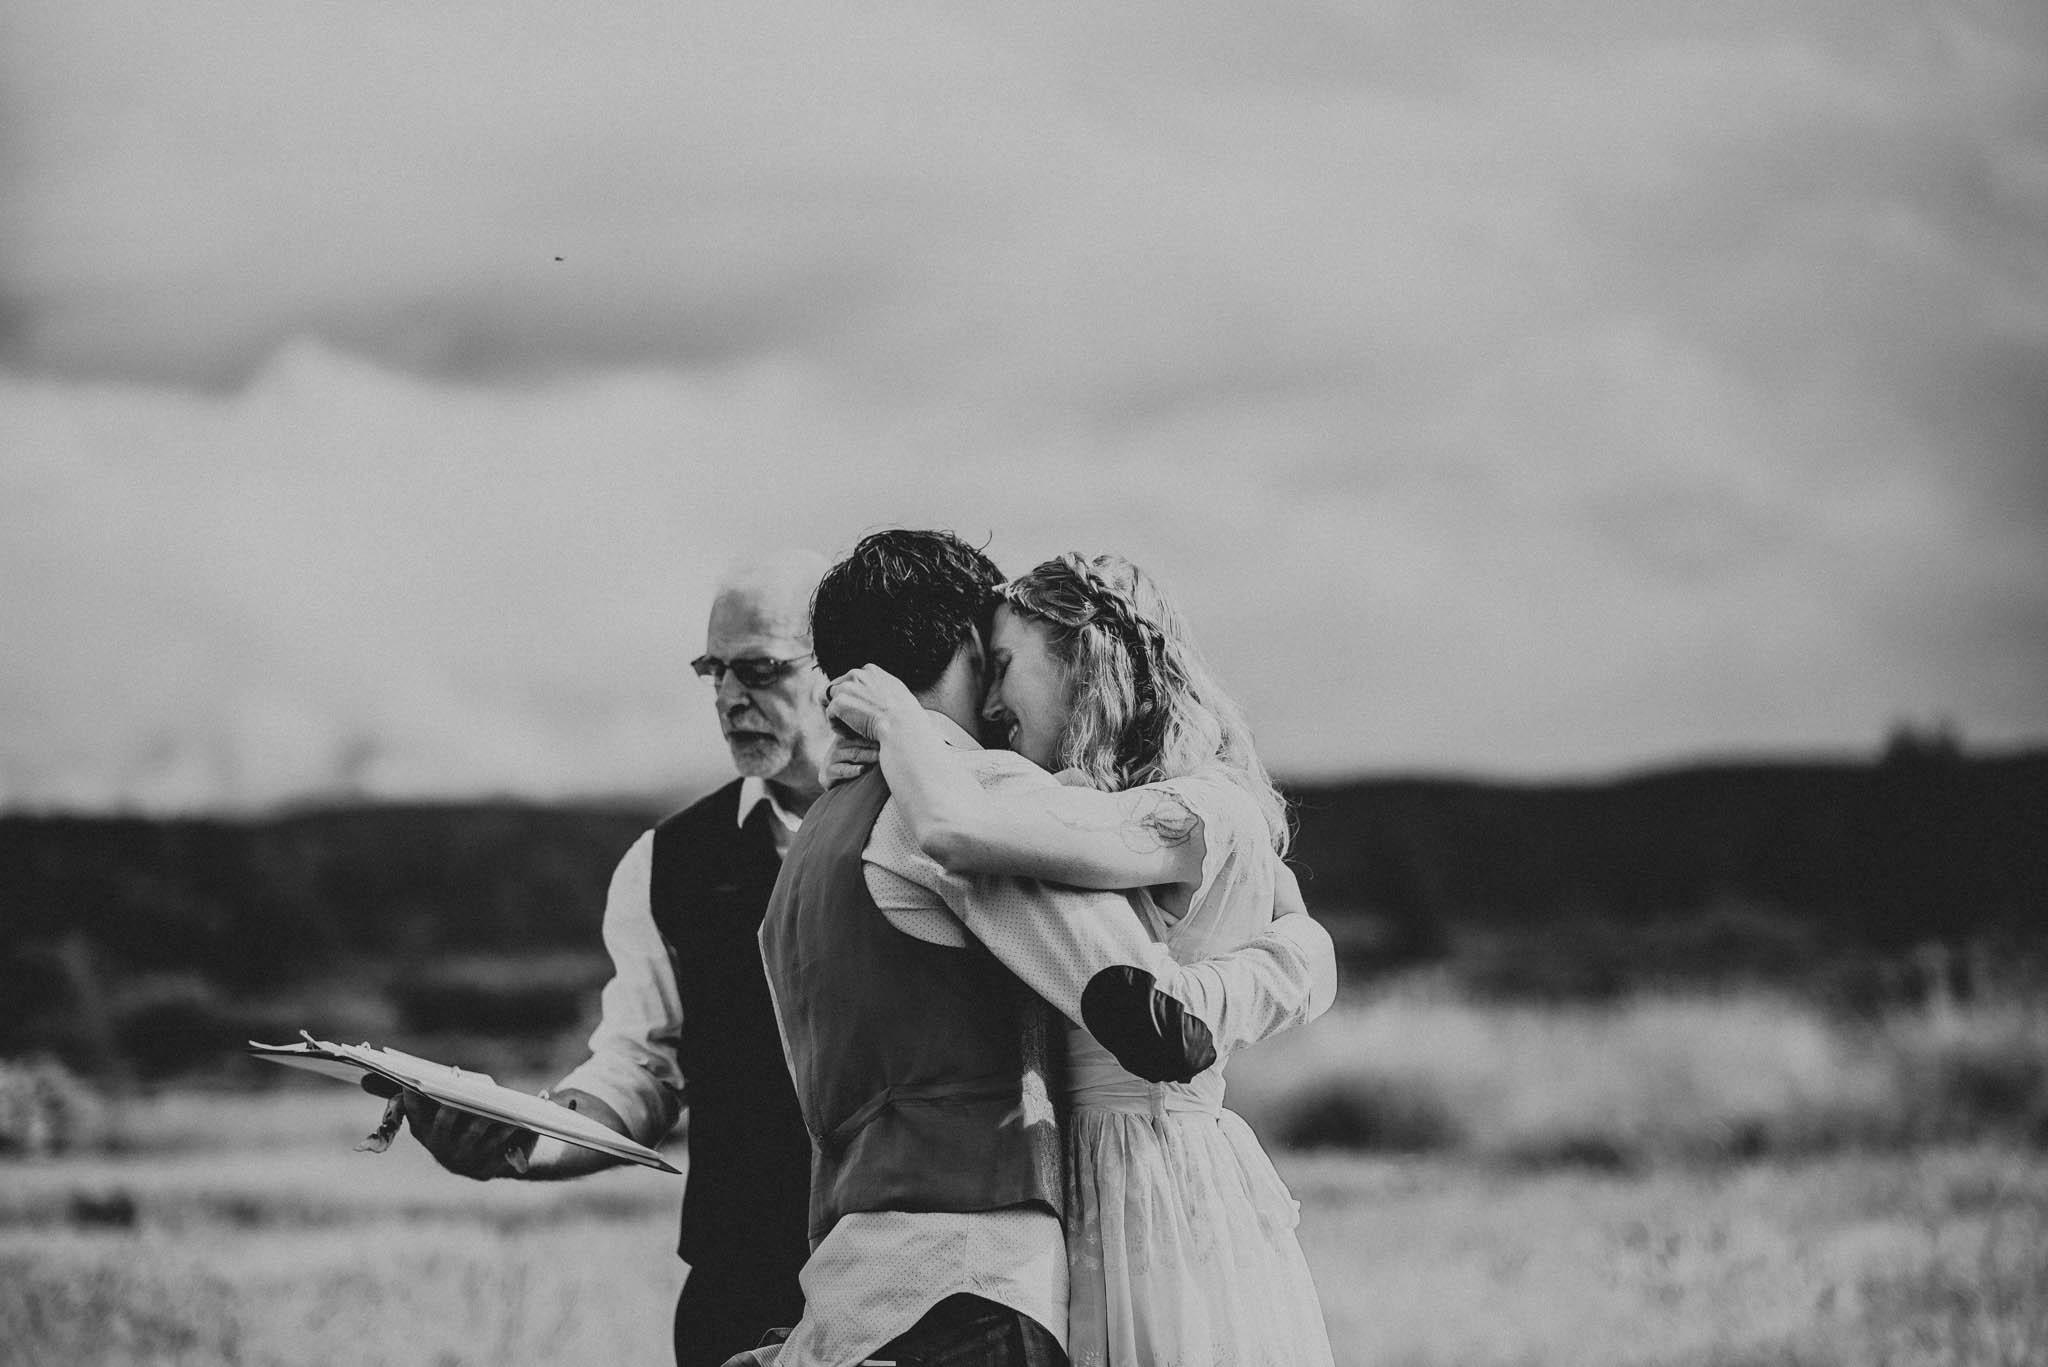 bride and groom hug during wedding ceremony